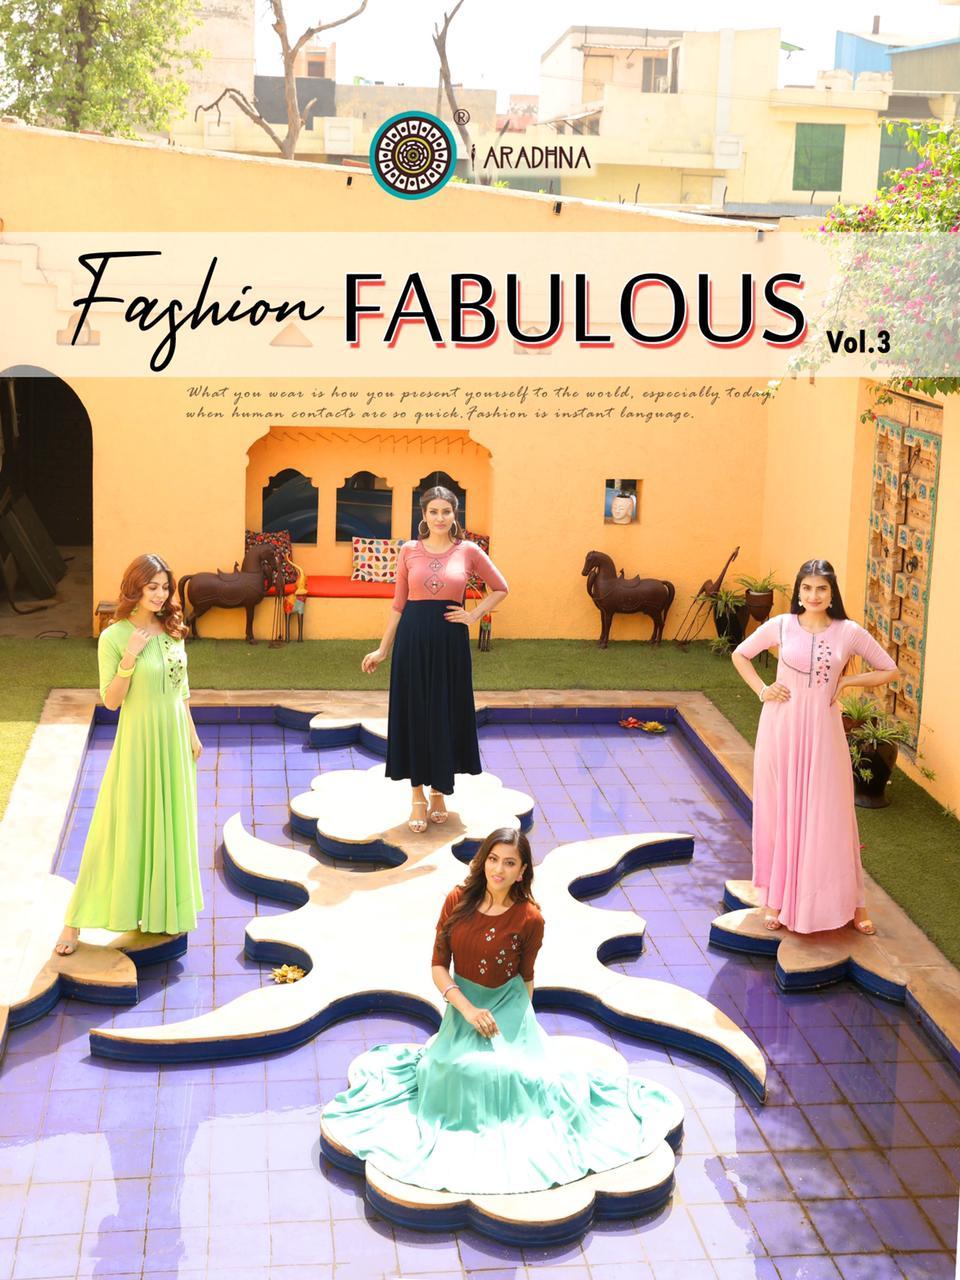 Aradhna Fashion Fabulous Vol 3 Kurti Wholesale Catalog 12 Pcs 2 - Aradhna Fashion Fabulous Vol 3 Kurti Wholesale Catalog 12 Pcs